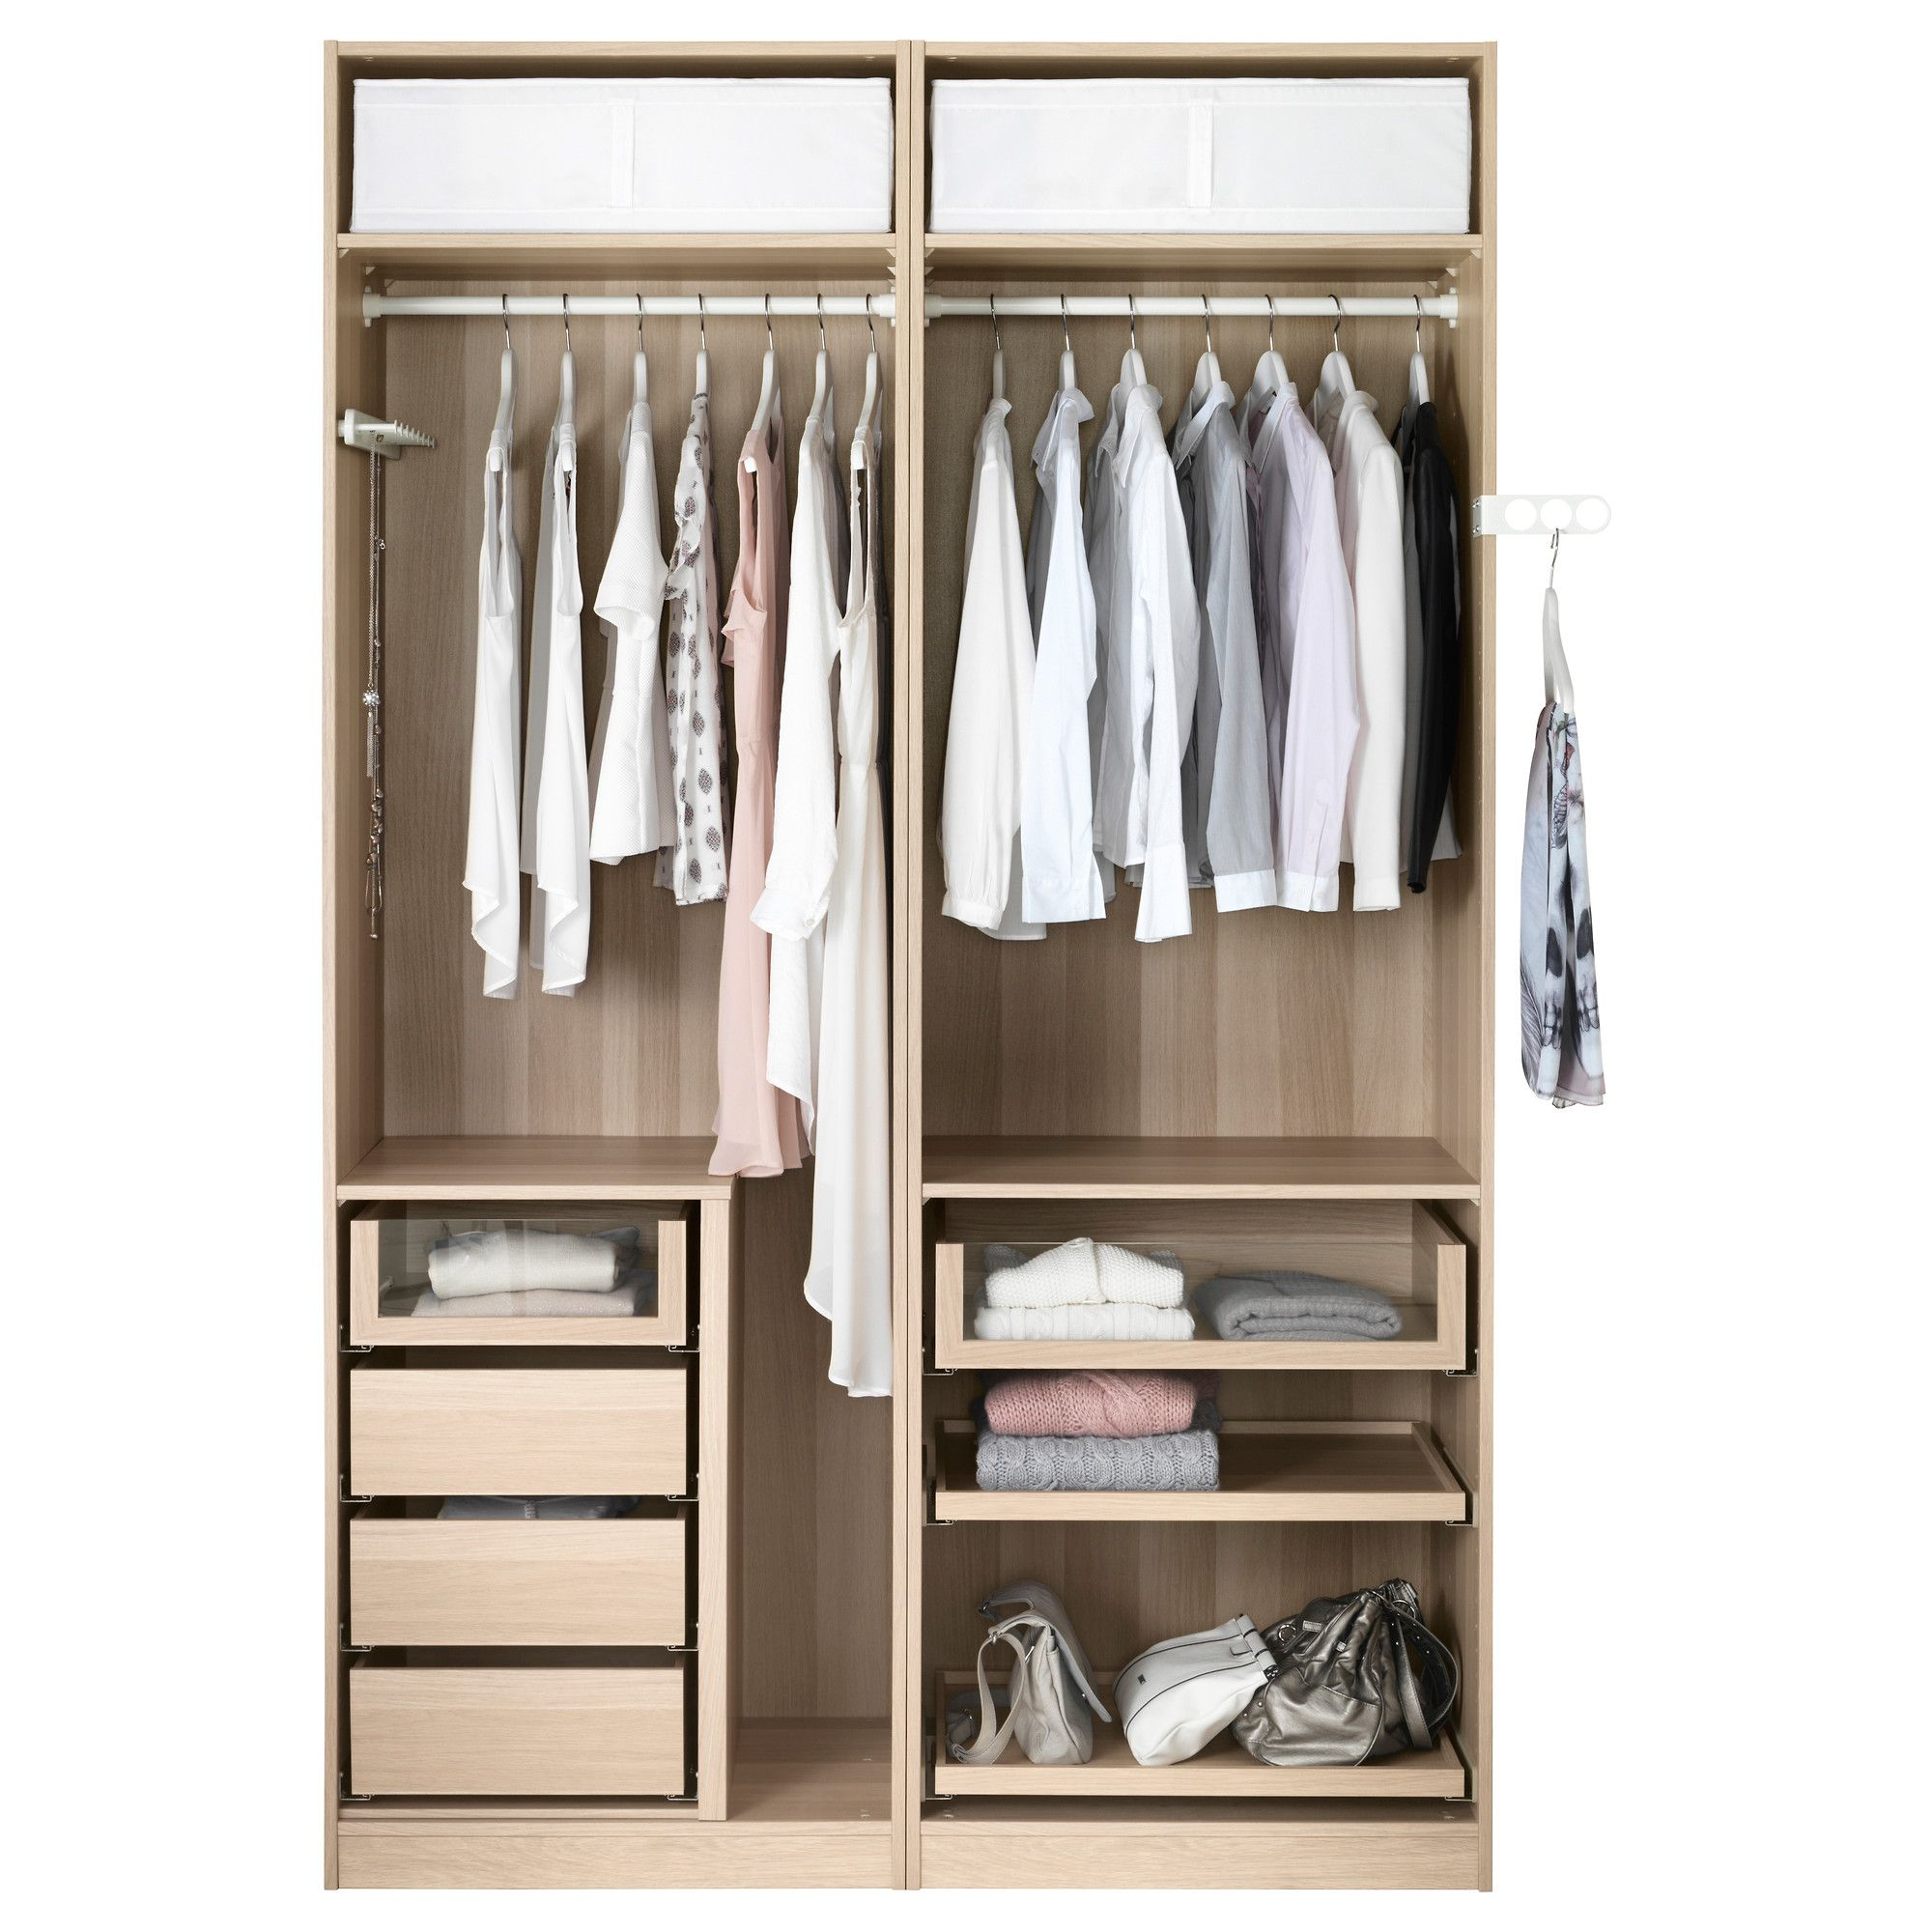 komplement divider for frame - Google Search  Ikea Pax WardrobeMaster ...